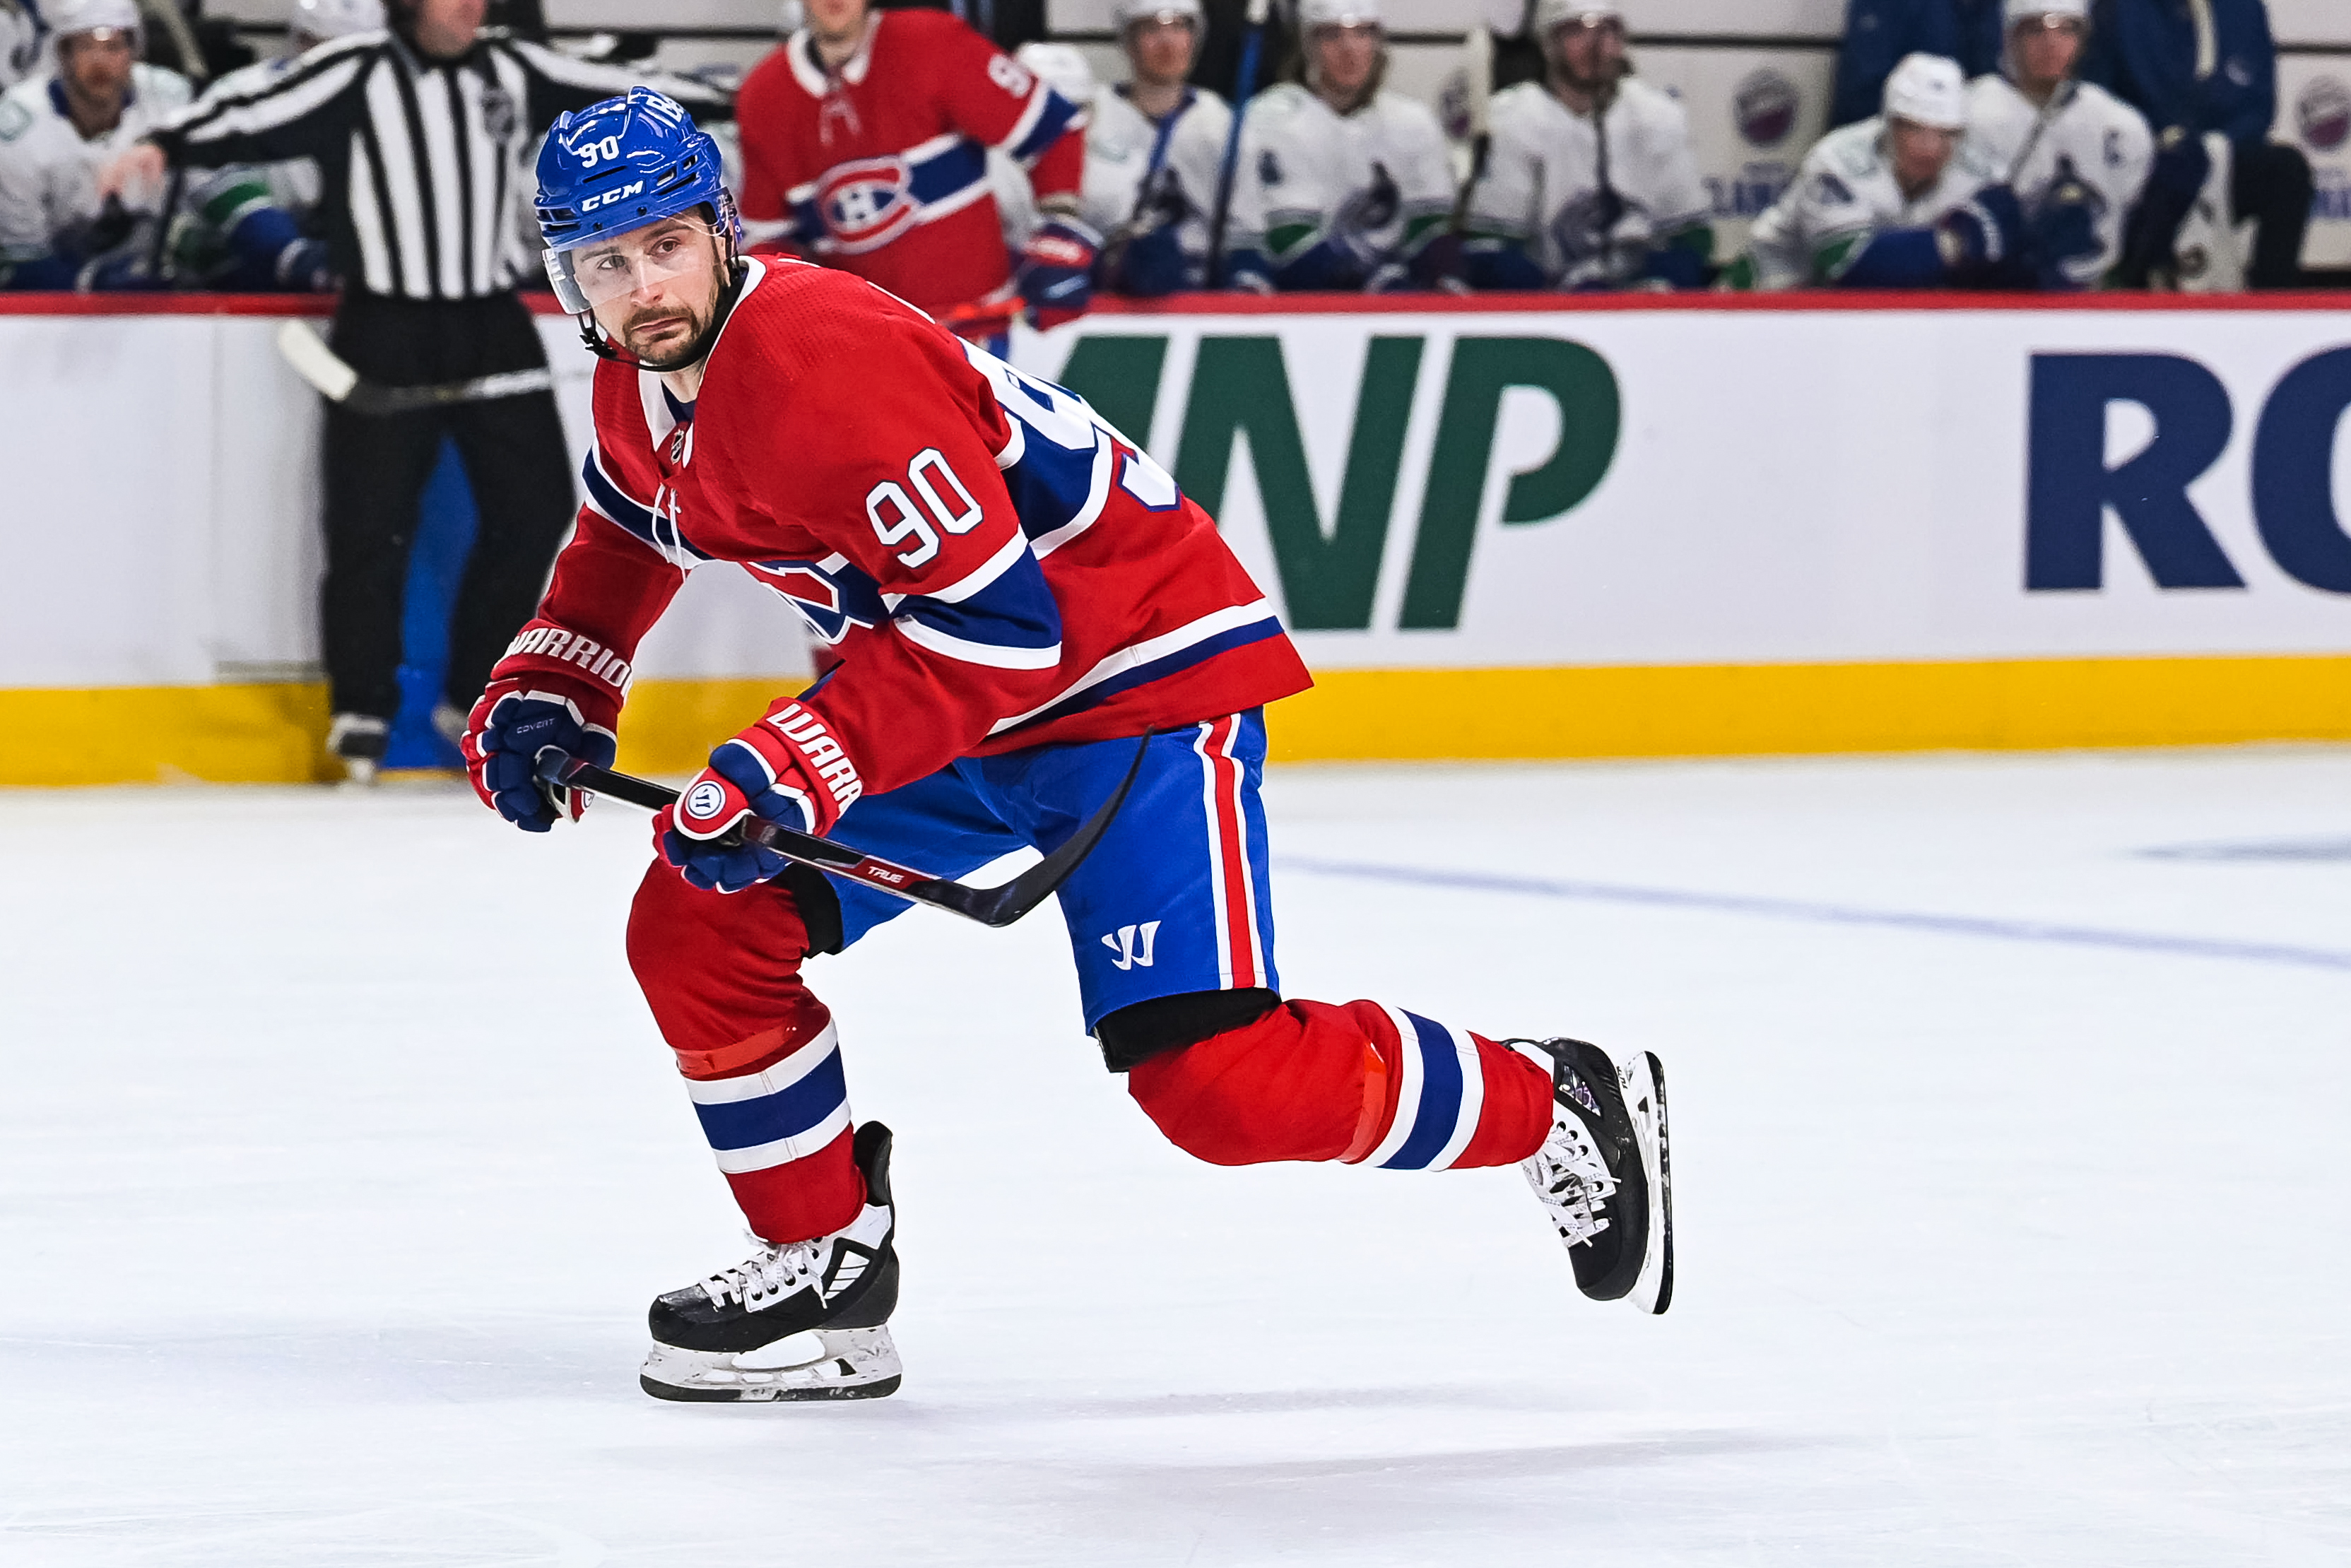 NHL: FEB 02 Canucks at Canadiens